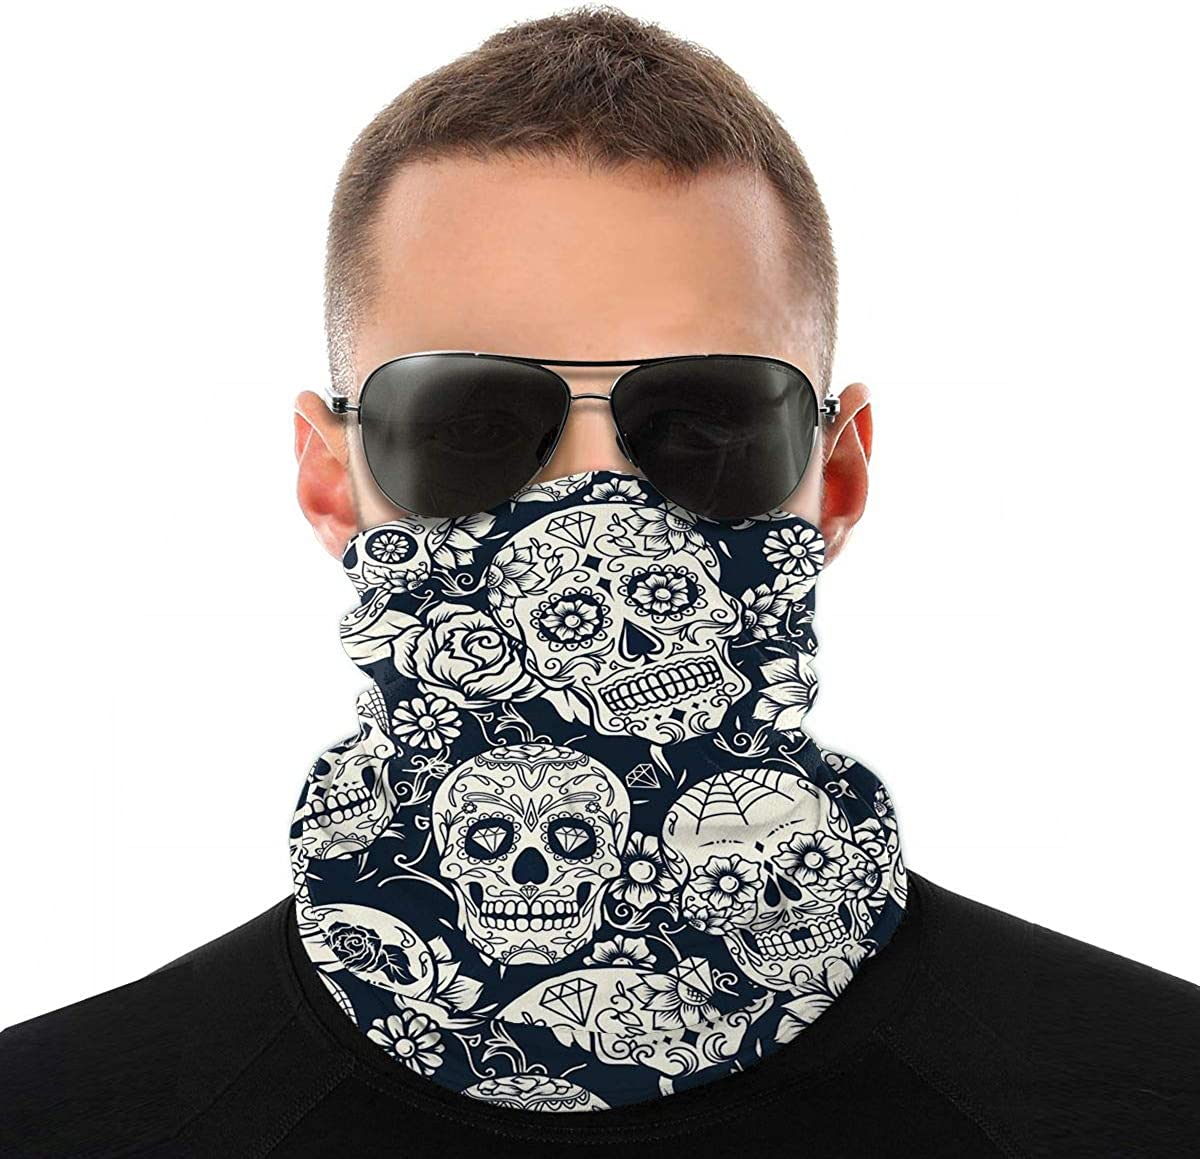 Kiuloam Bandanas Face Mask, Stylish Paisley Floral Skull Neck Gaiter Mask Headband for Men Women Face Scarf Dust, Outdoors, Sports